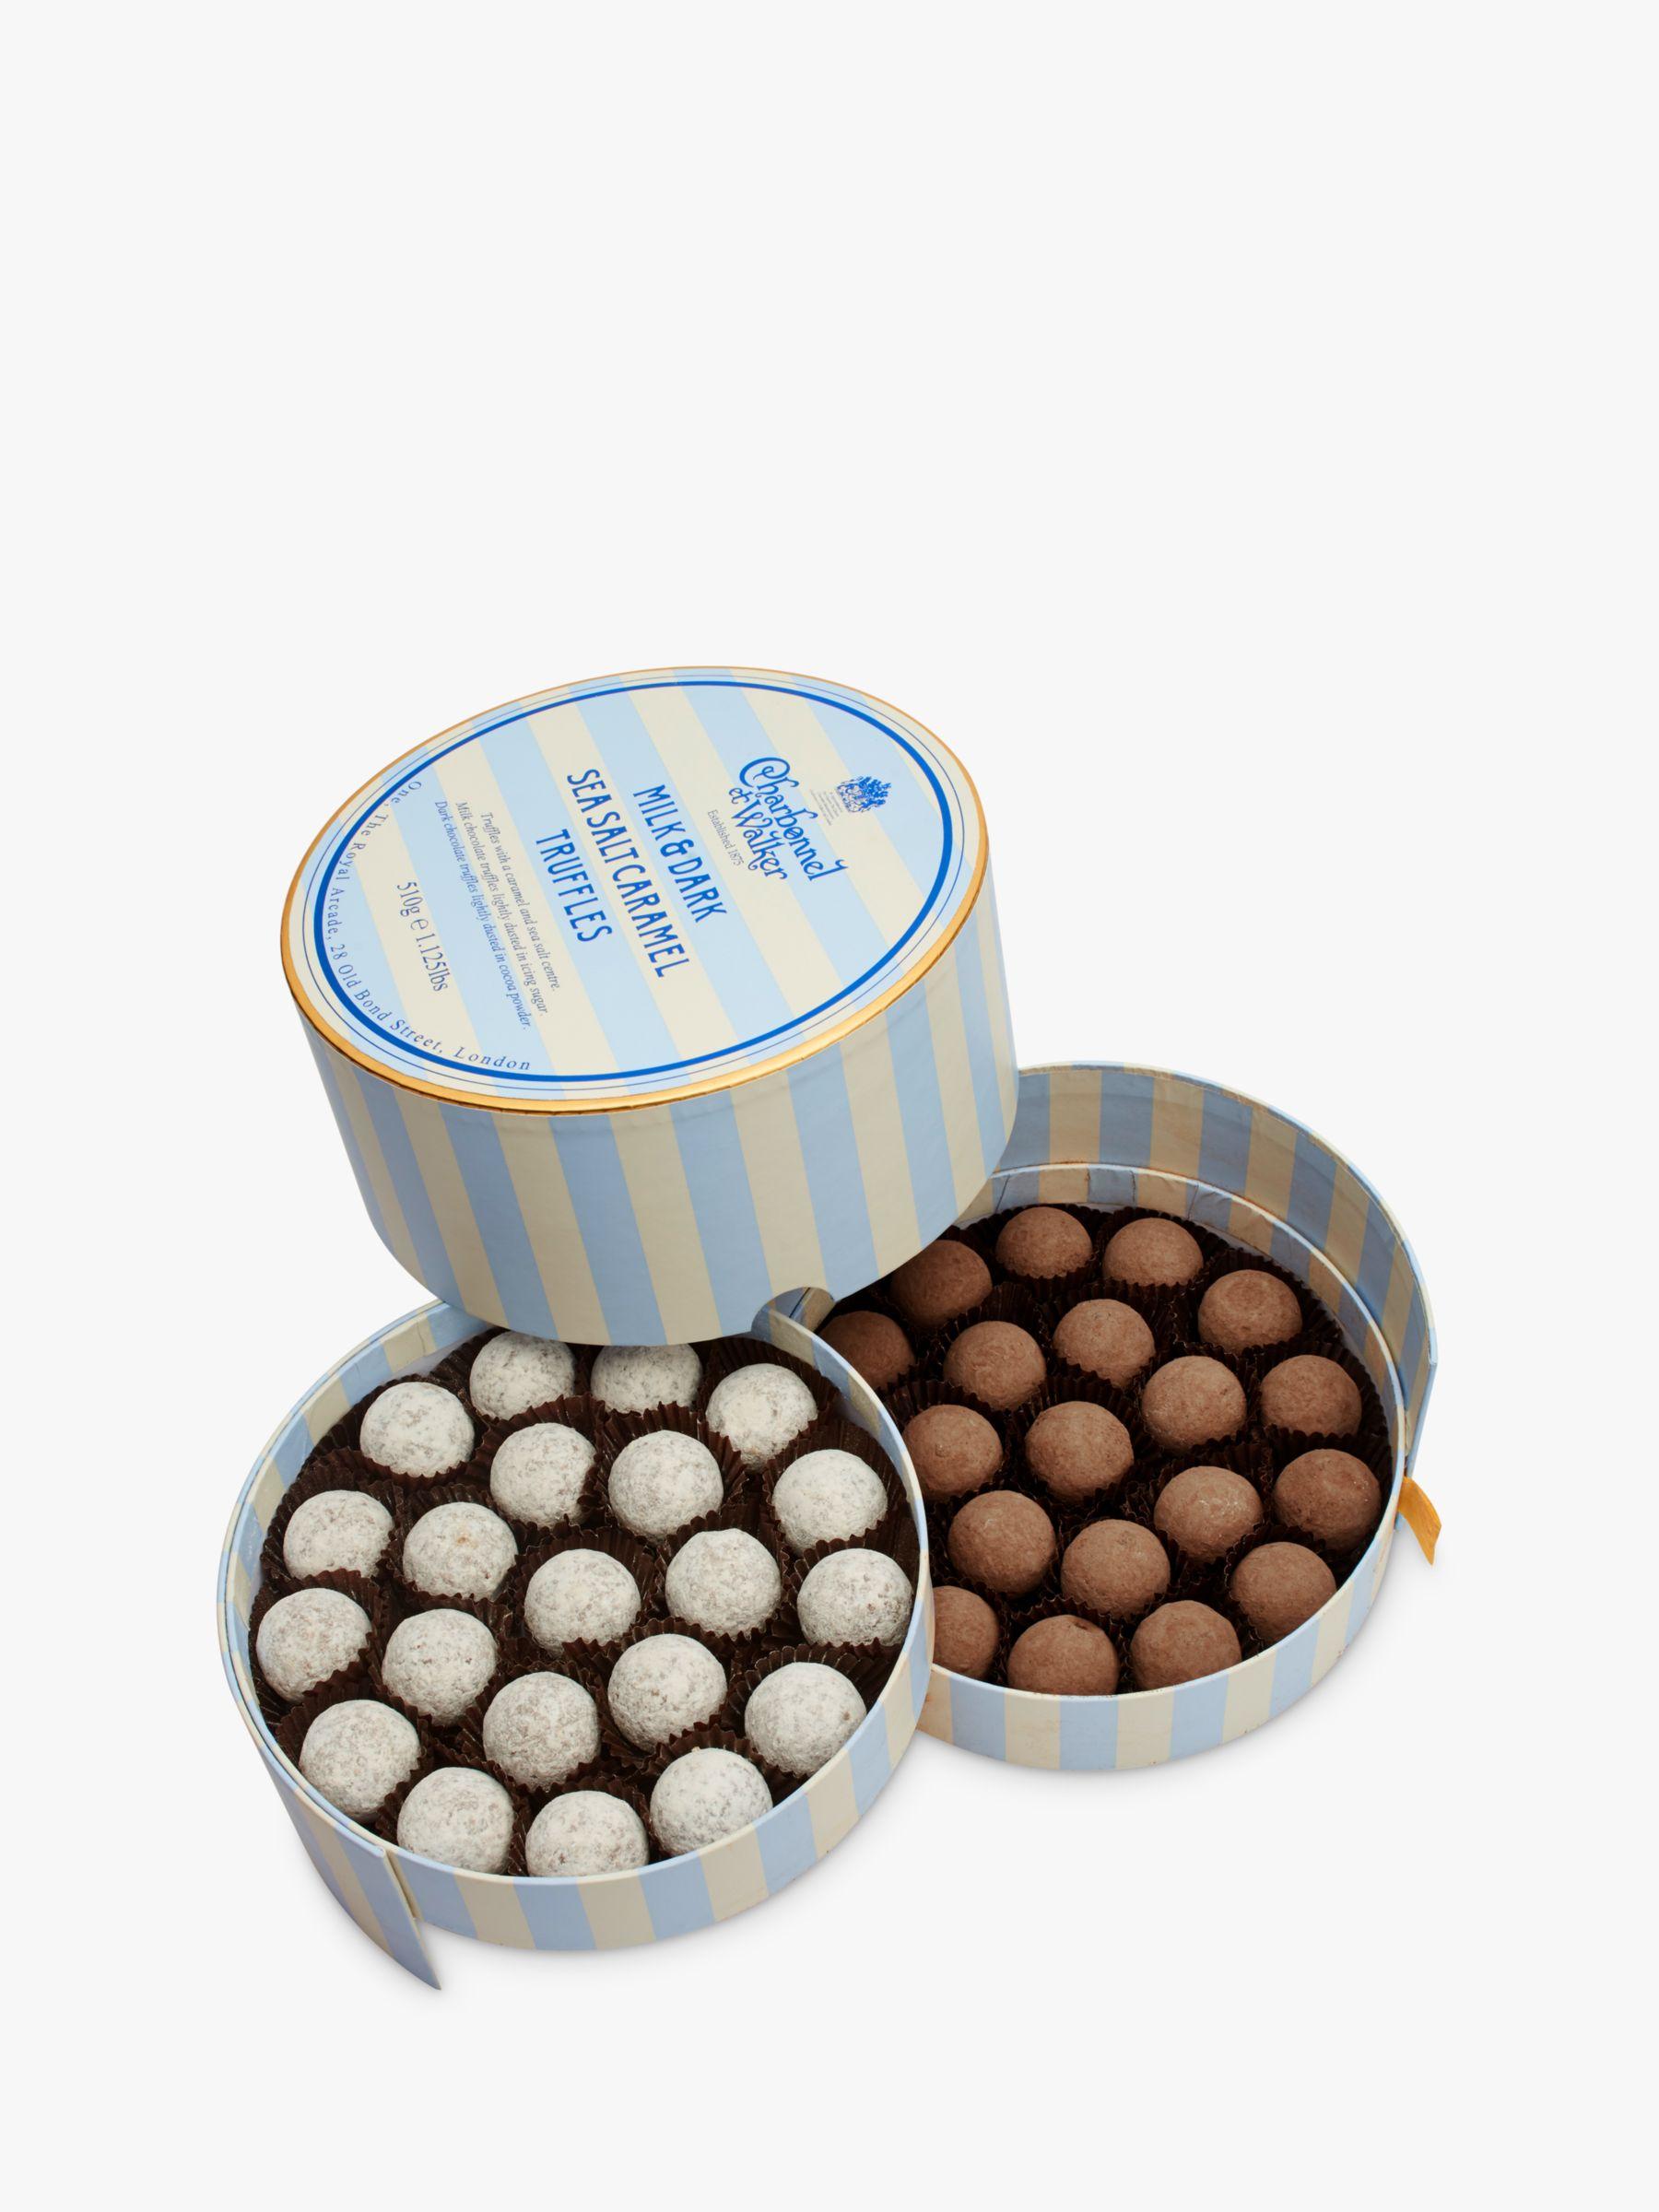 Charbonnel et Walker Charbonnel et Walker Milk & Dark Chocolate Sea Salt Caramel Truffles